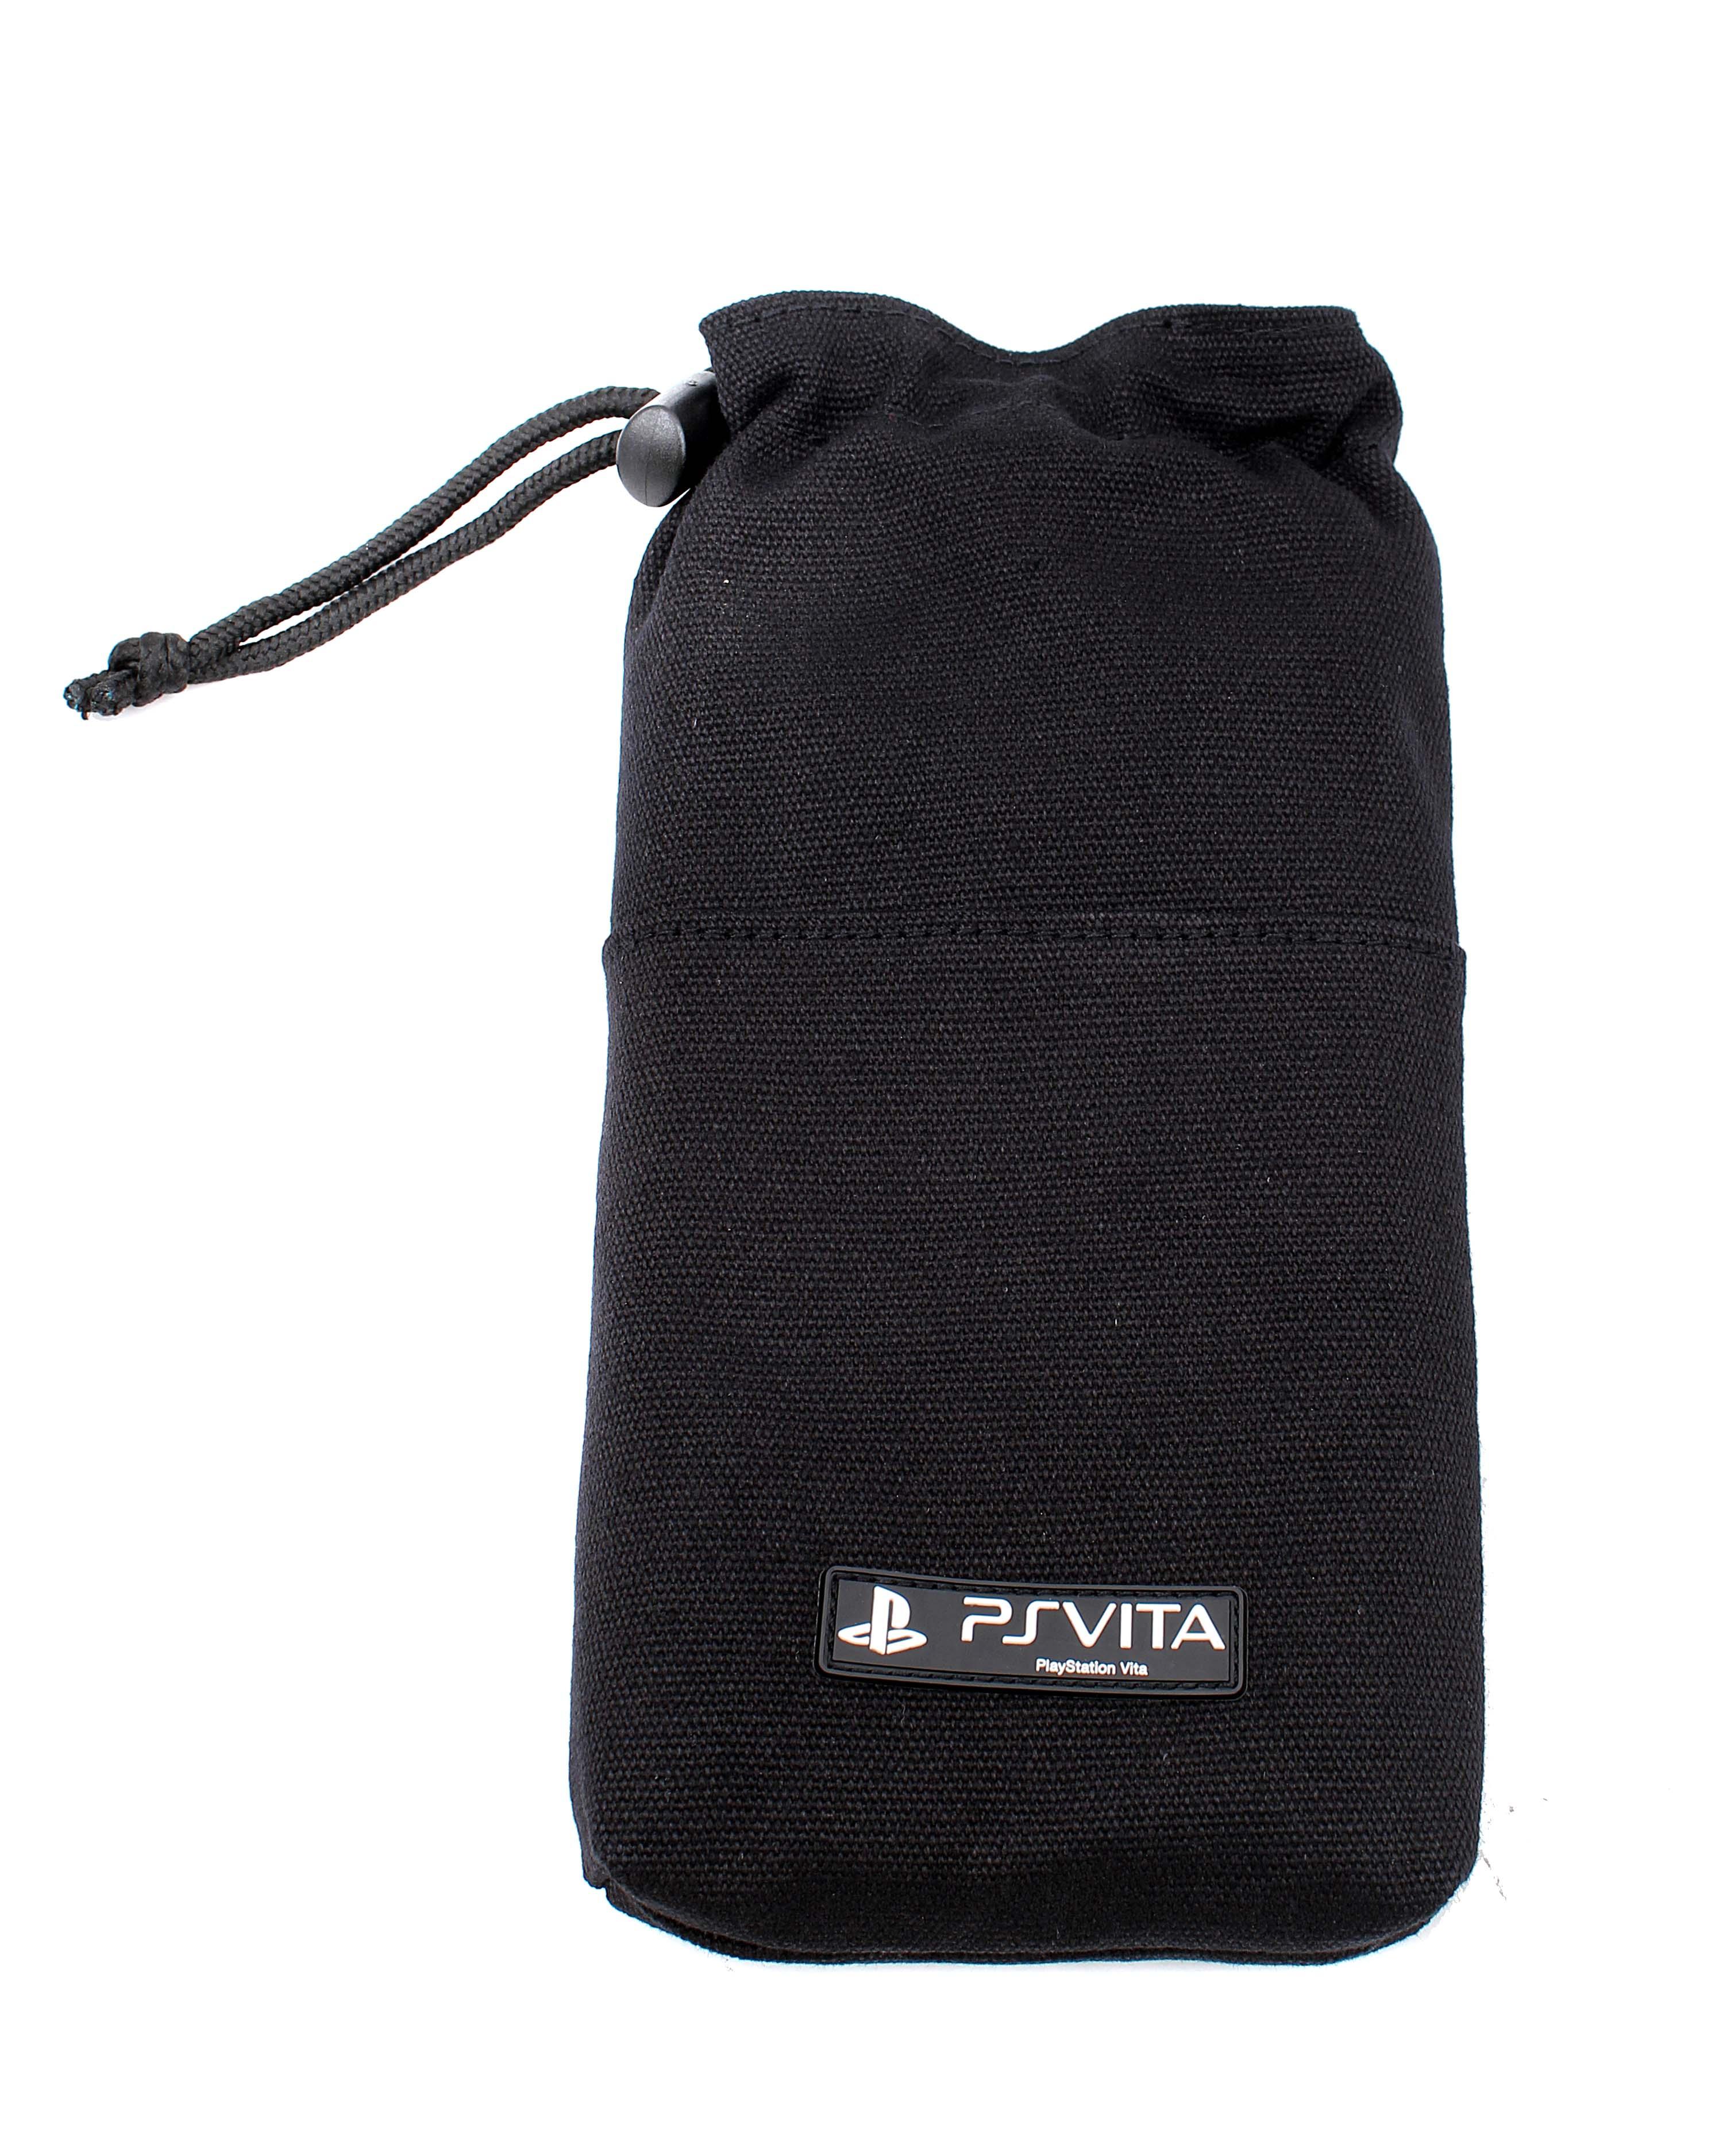 Аксессуары для Playstation Vita A4 Real Brand Technics 399.000